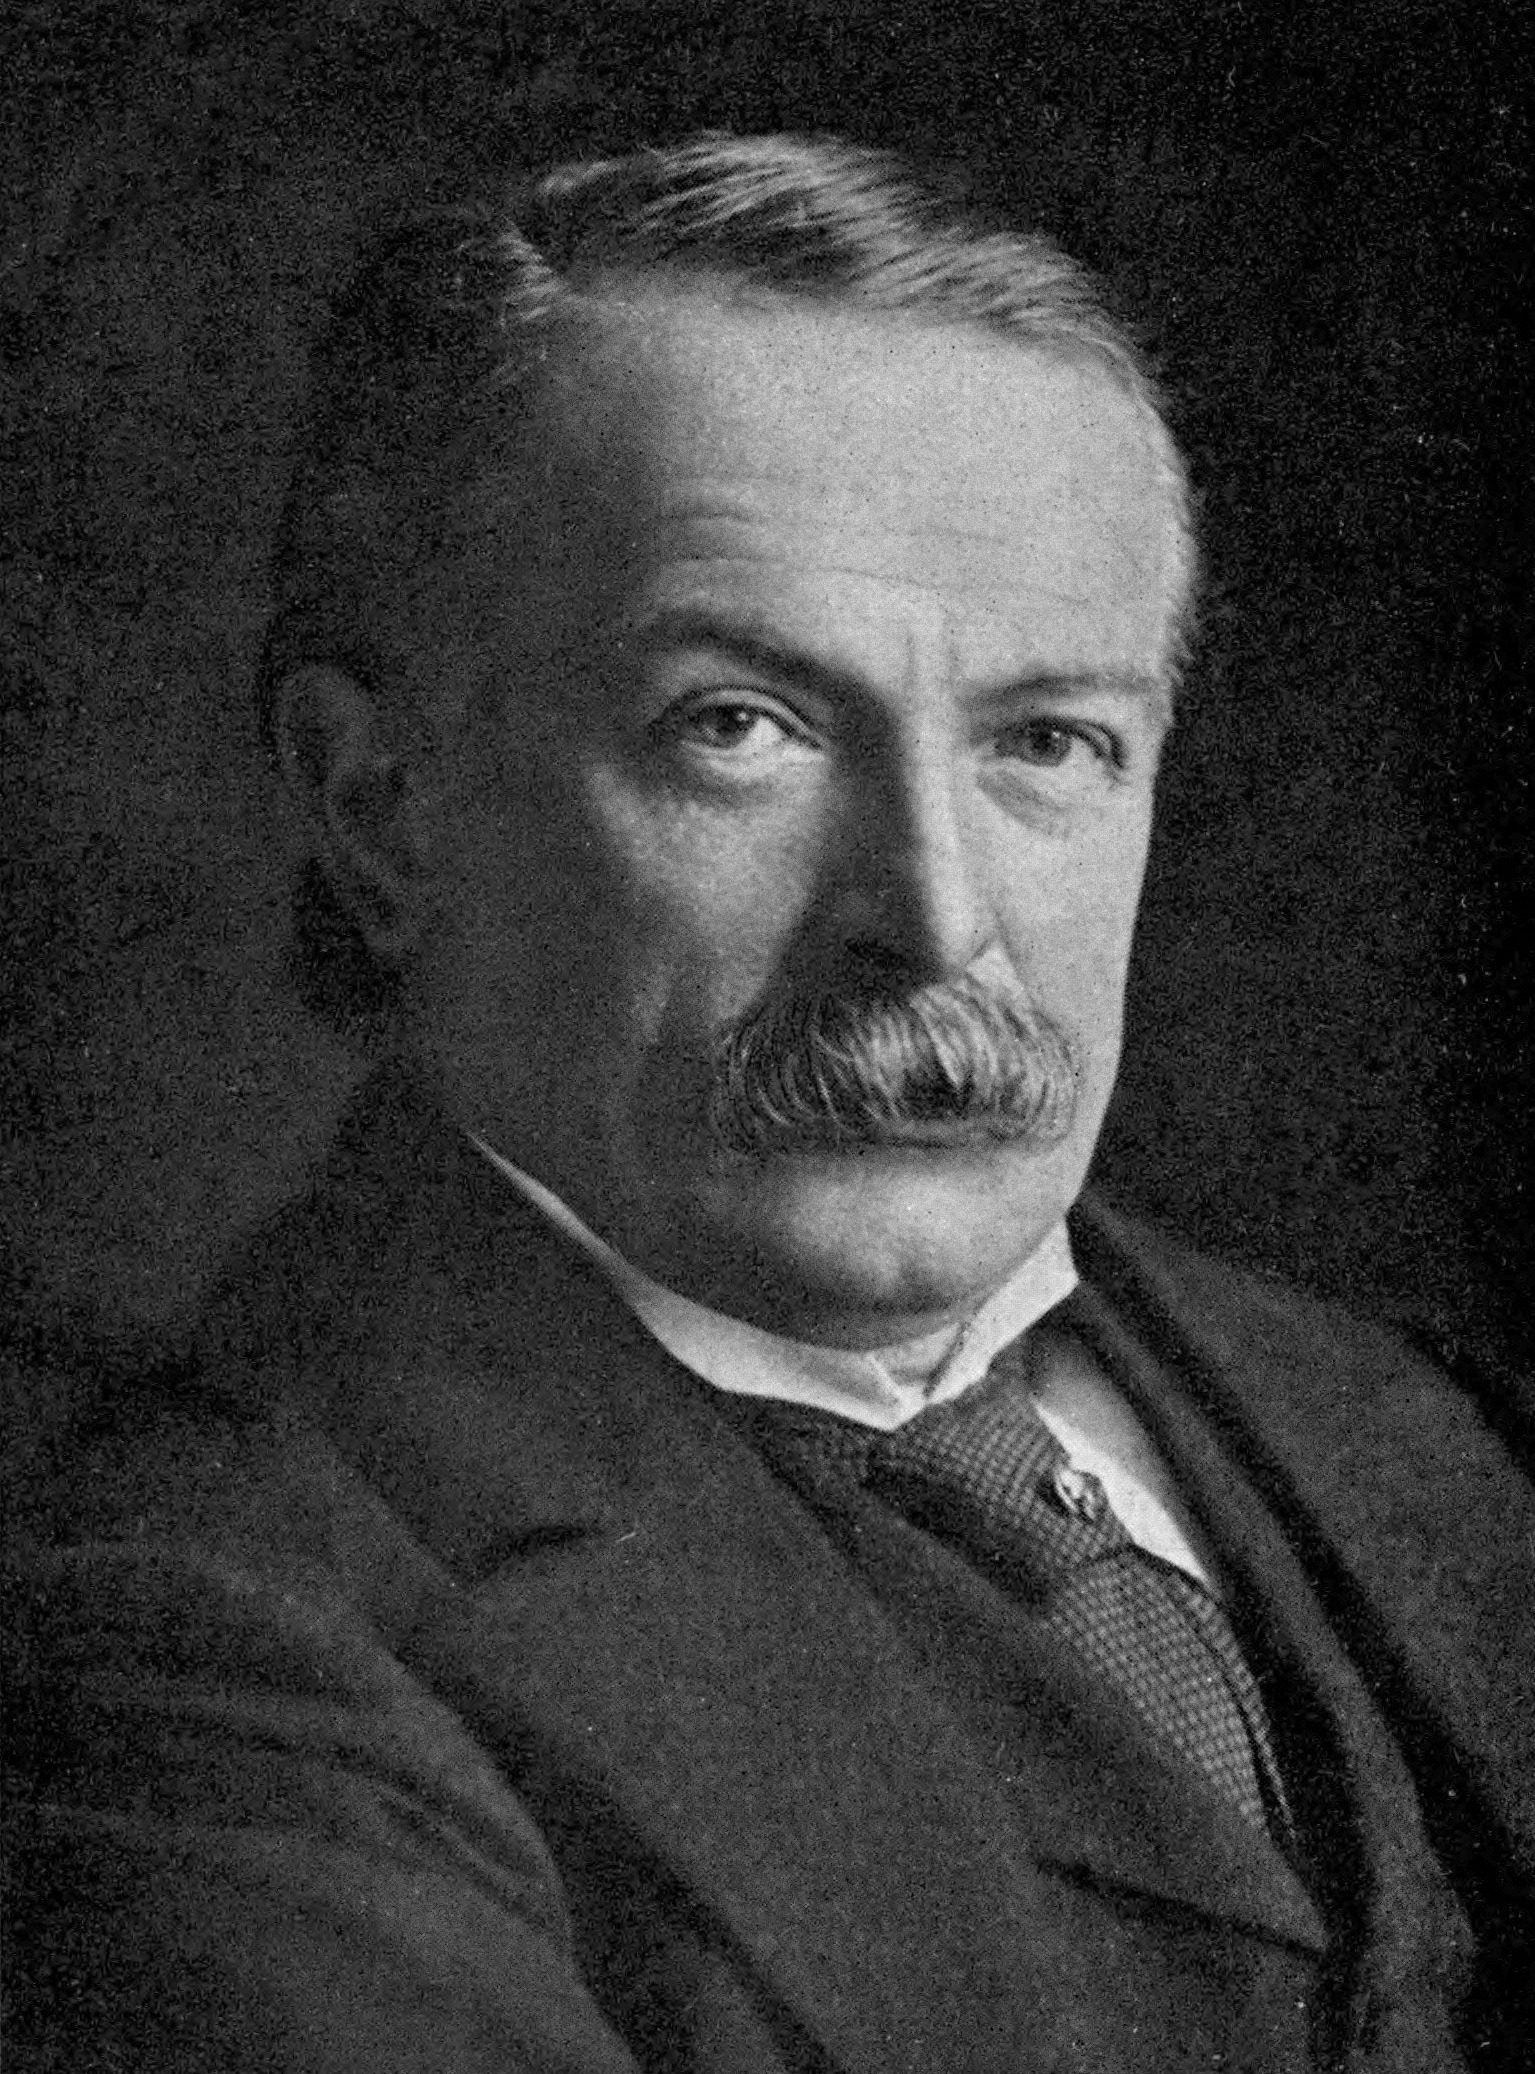 https://upload.wikimedia.org/wikipedia/commons/1/1e/The_Right_Hon._David_Lloyd_George.jpg